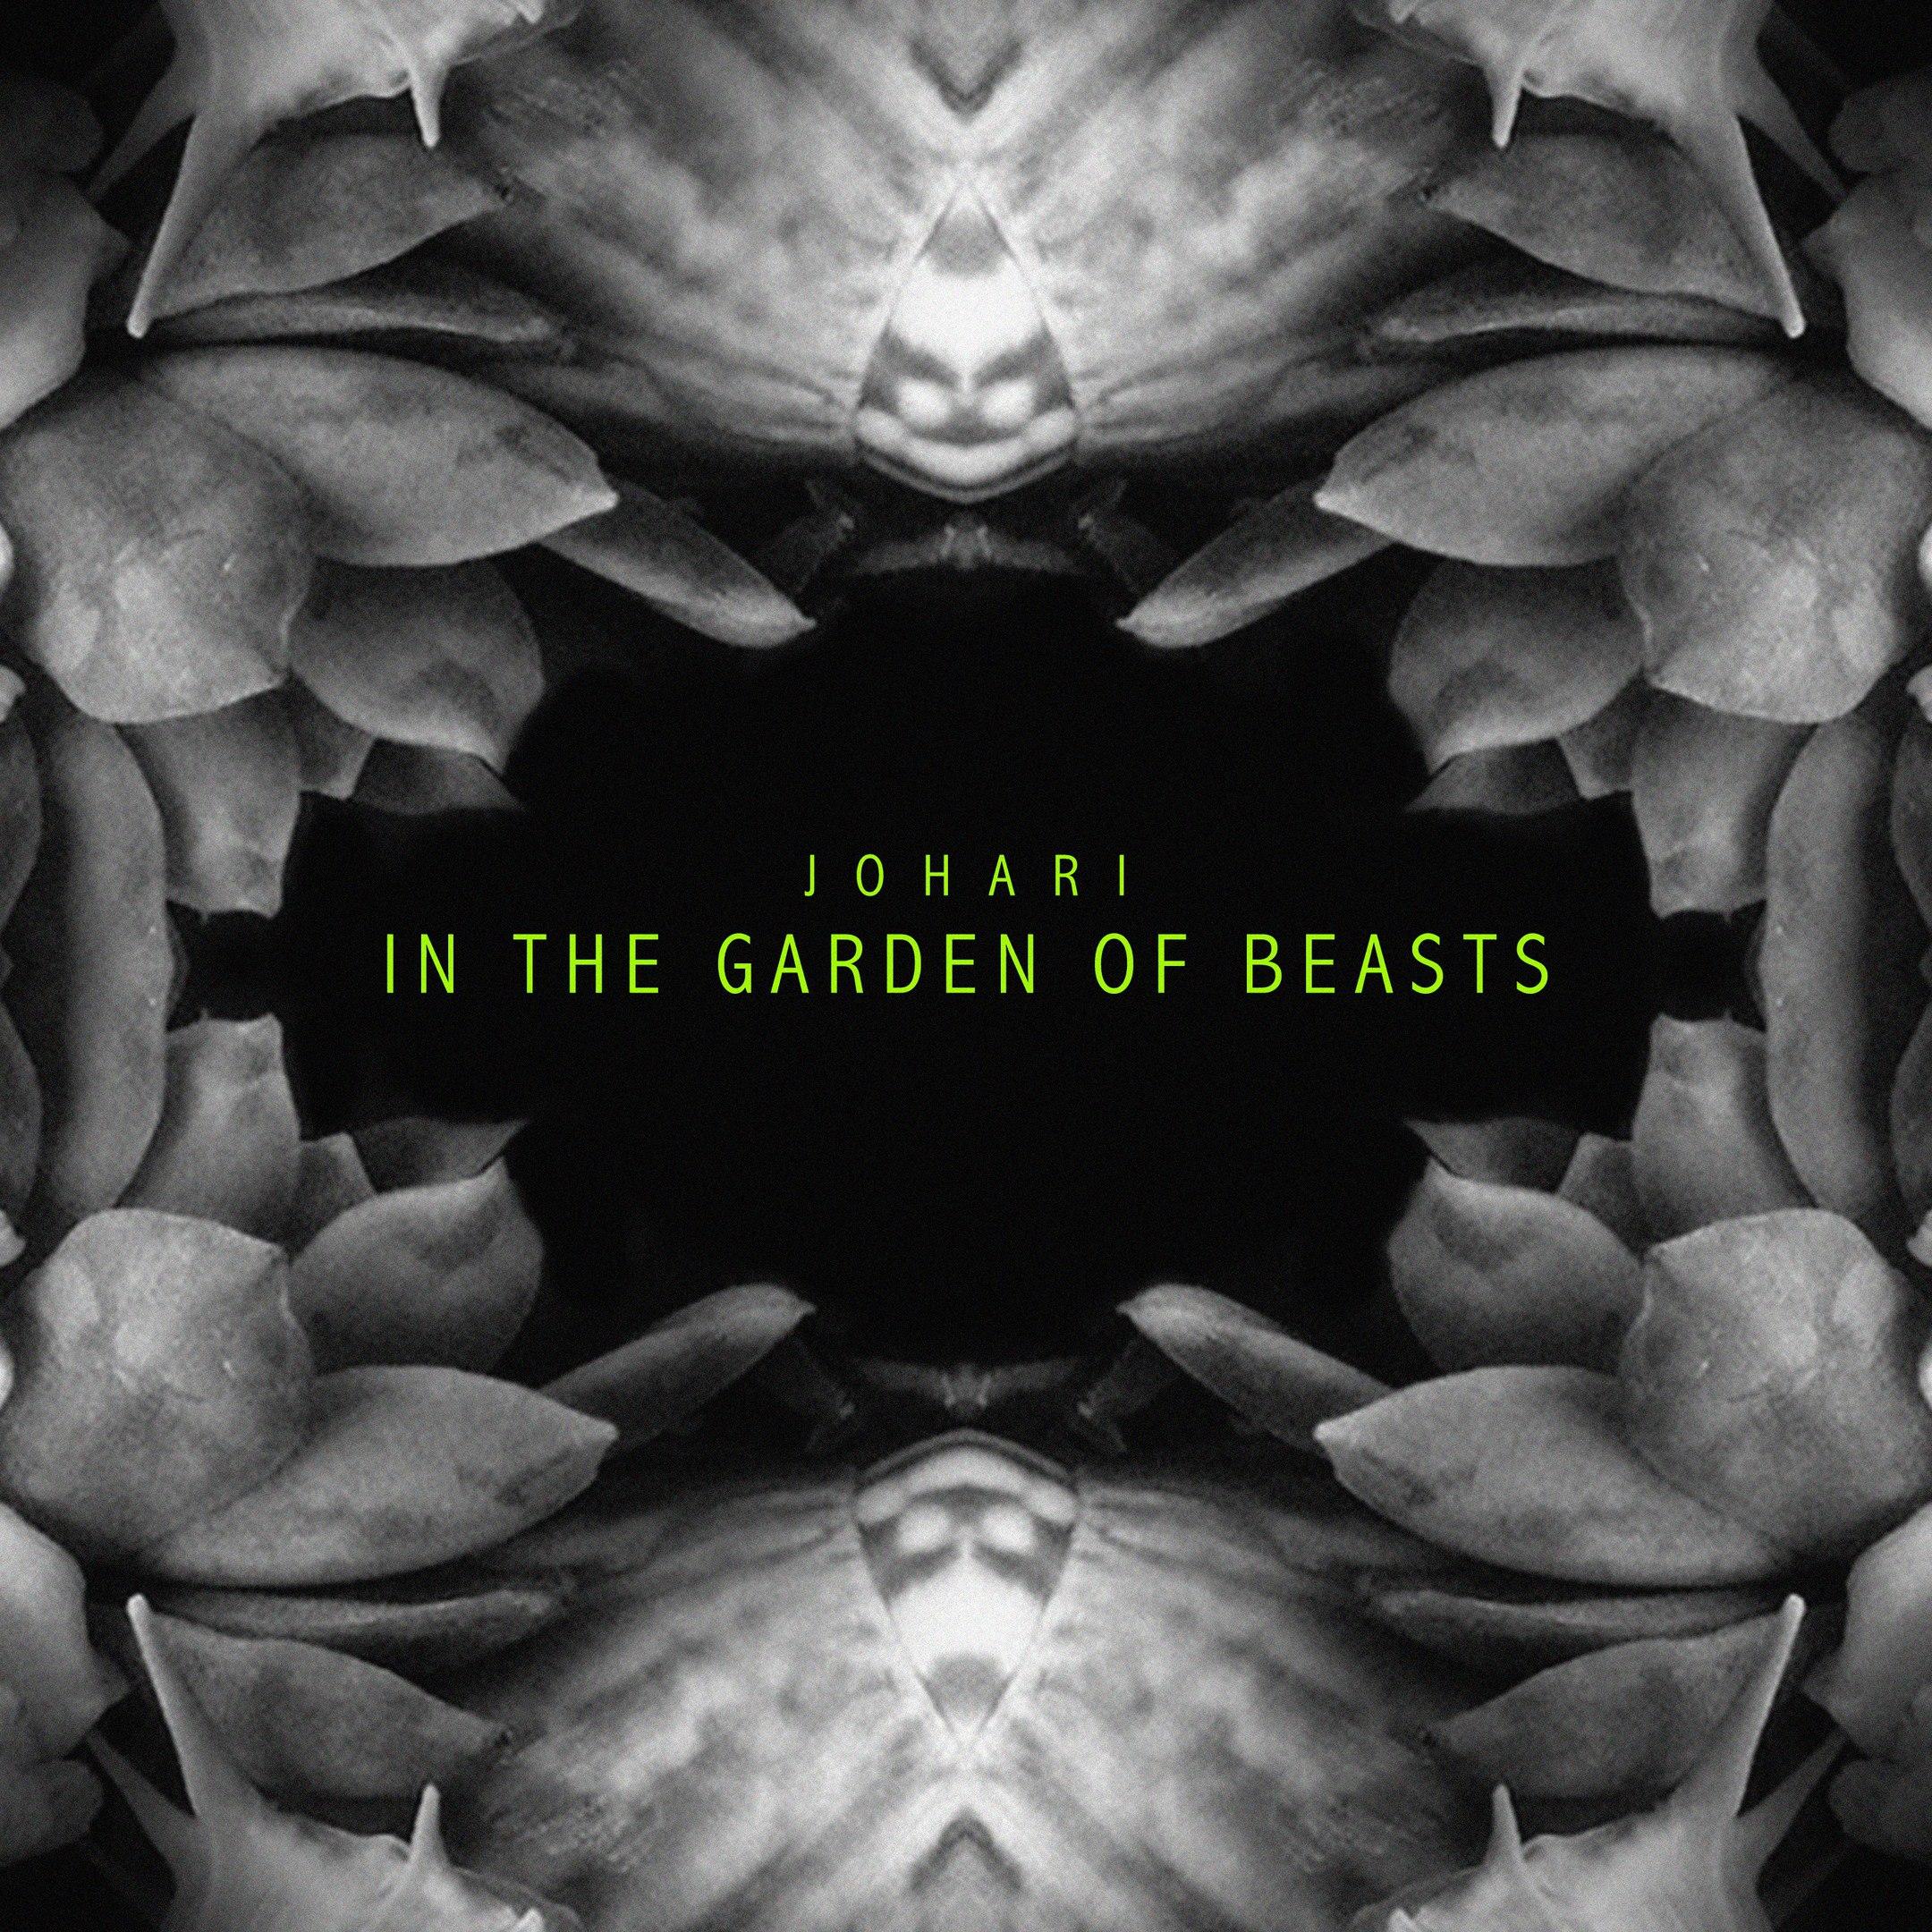 Johari - In the Garden of Beasts [single] (2017)